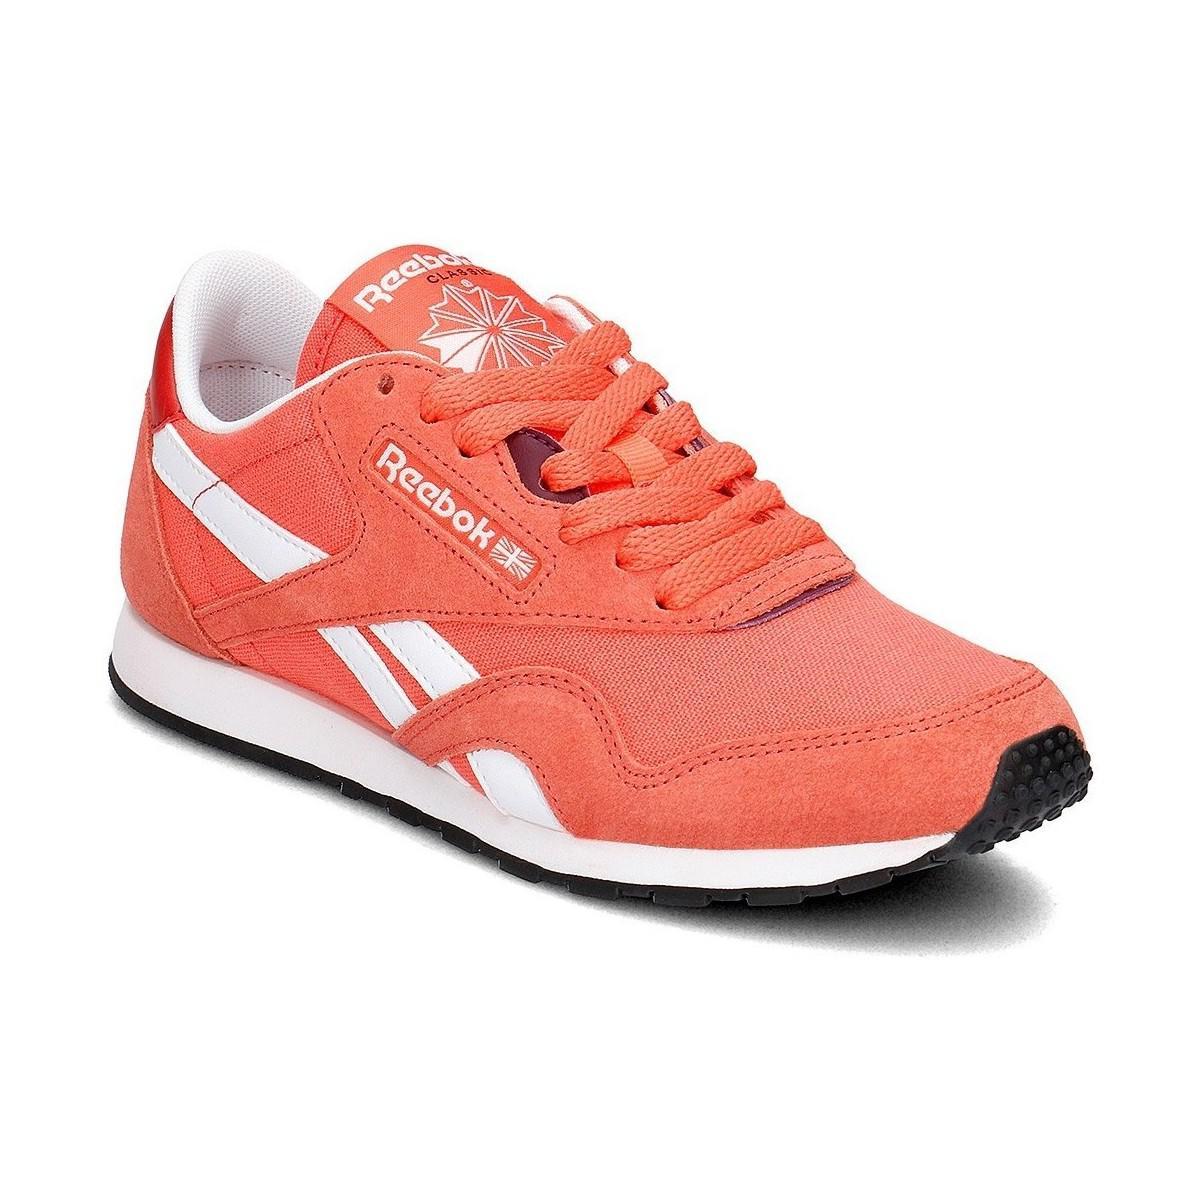 8357aee312ba Reebok Classic Nylon Slim Women s Shoes (trainers) In Orange in ...